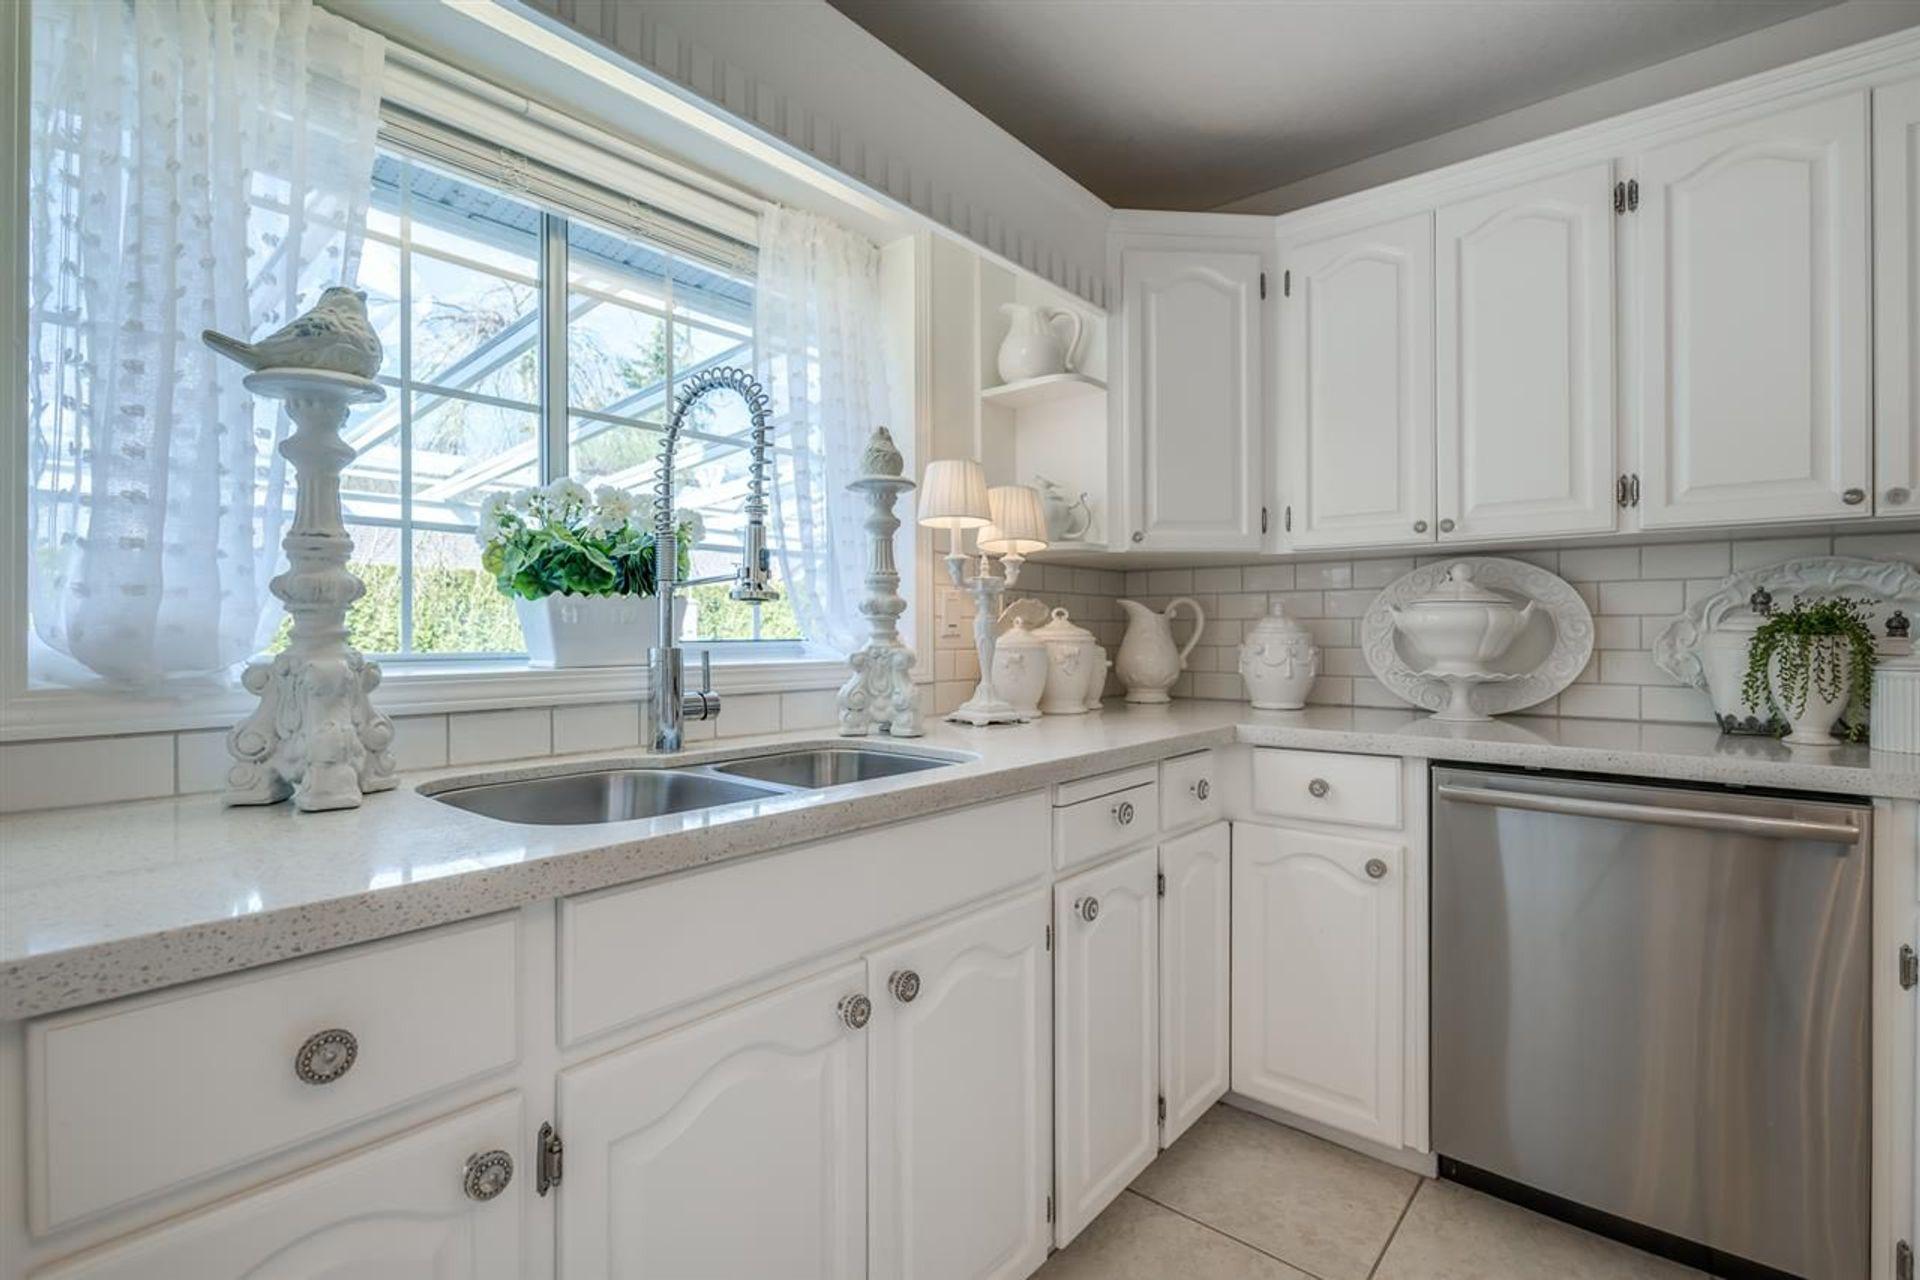 12603-215-street-west-central-maple-ridge-11 at 12603 215 Street, West Central, Maple Ridge